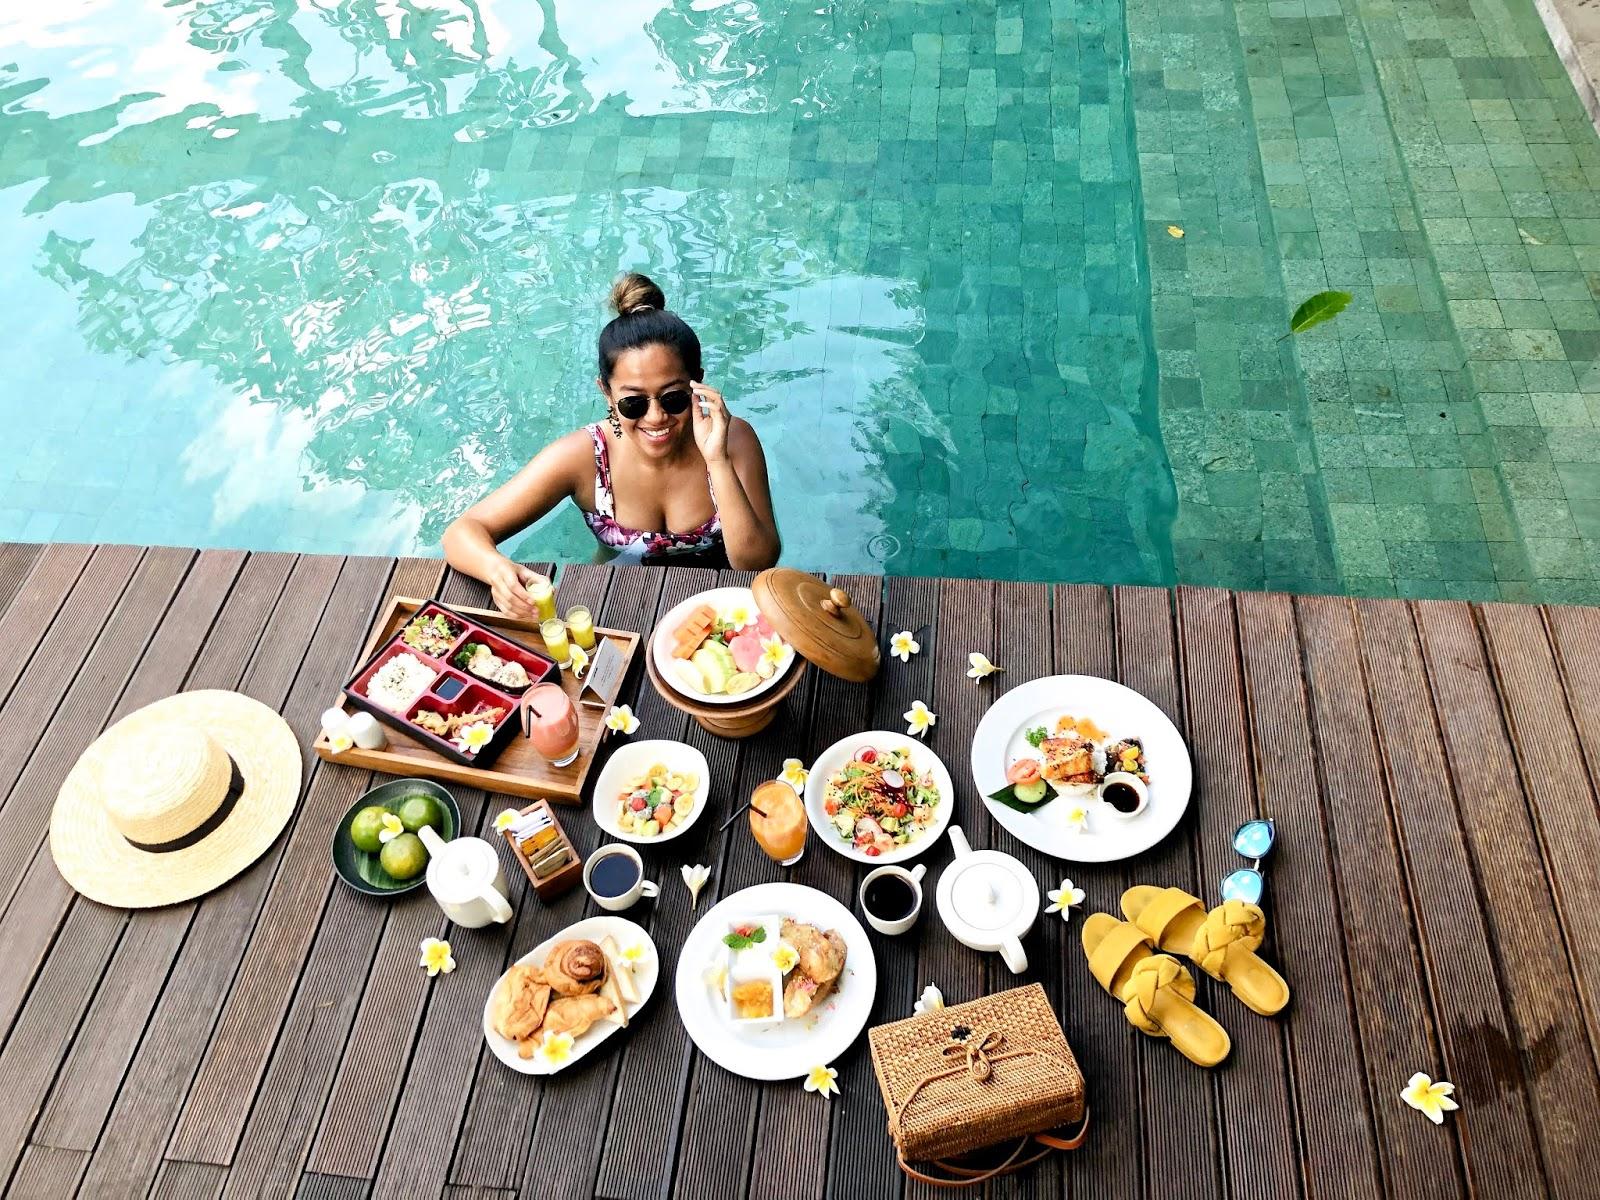 The Santai Food - Pool